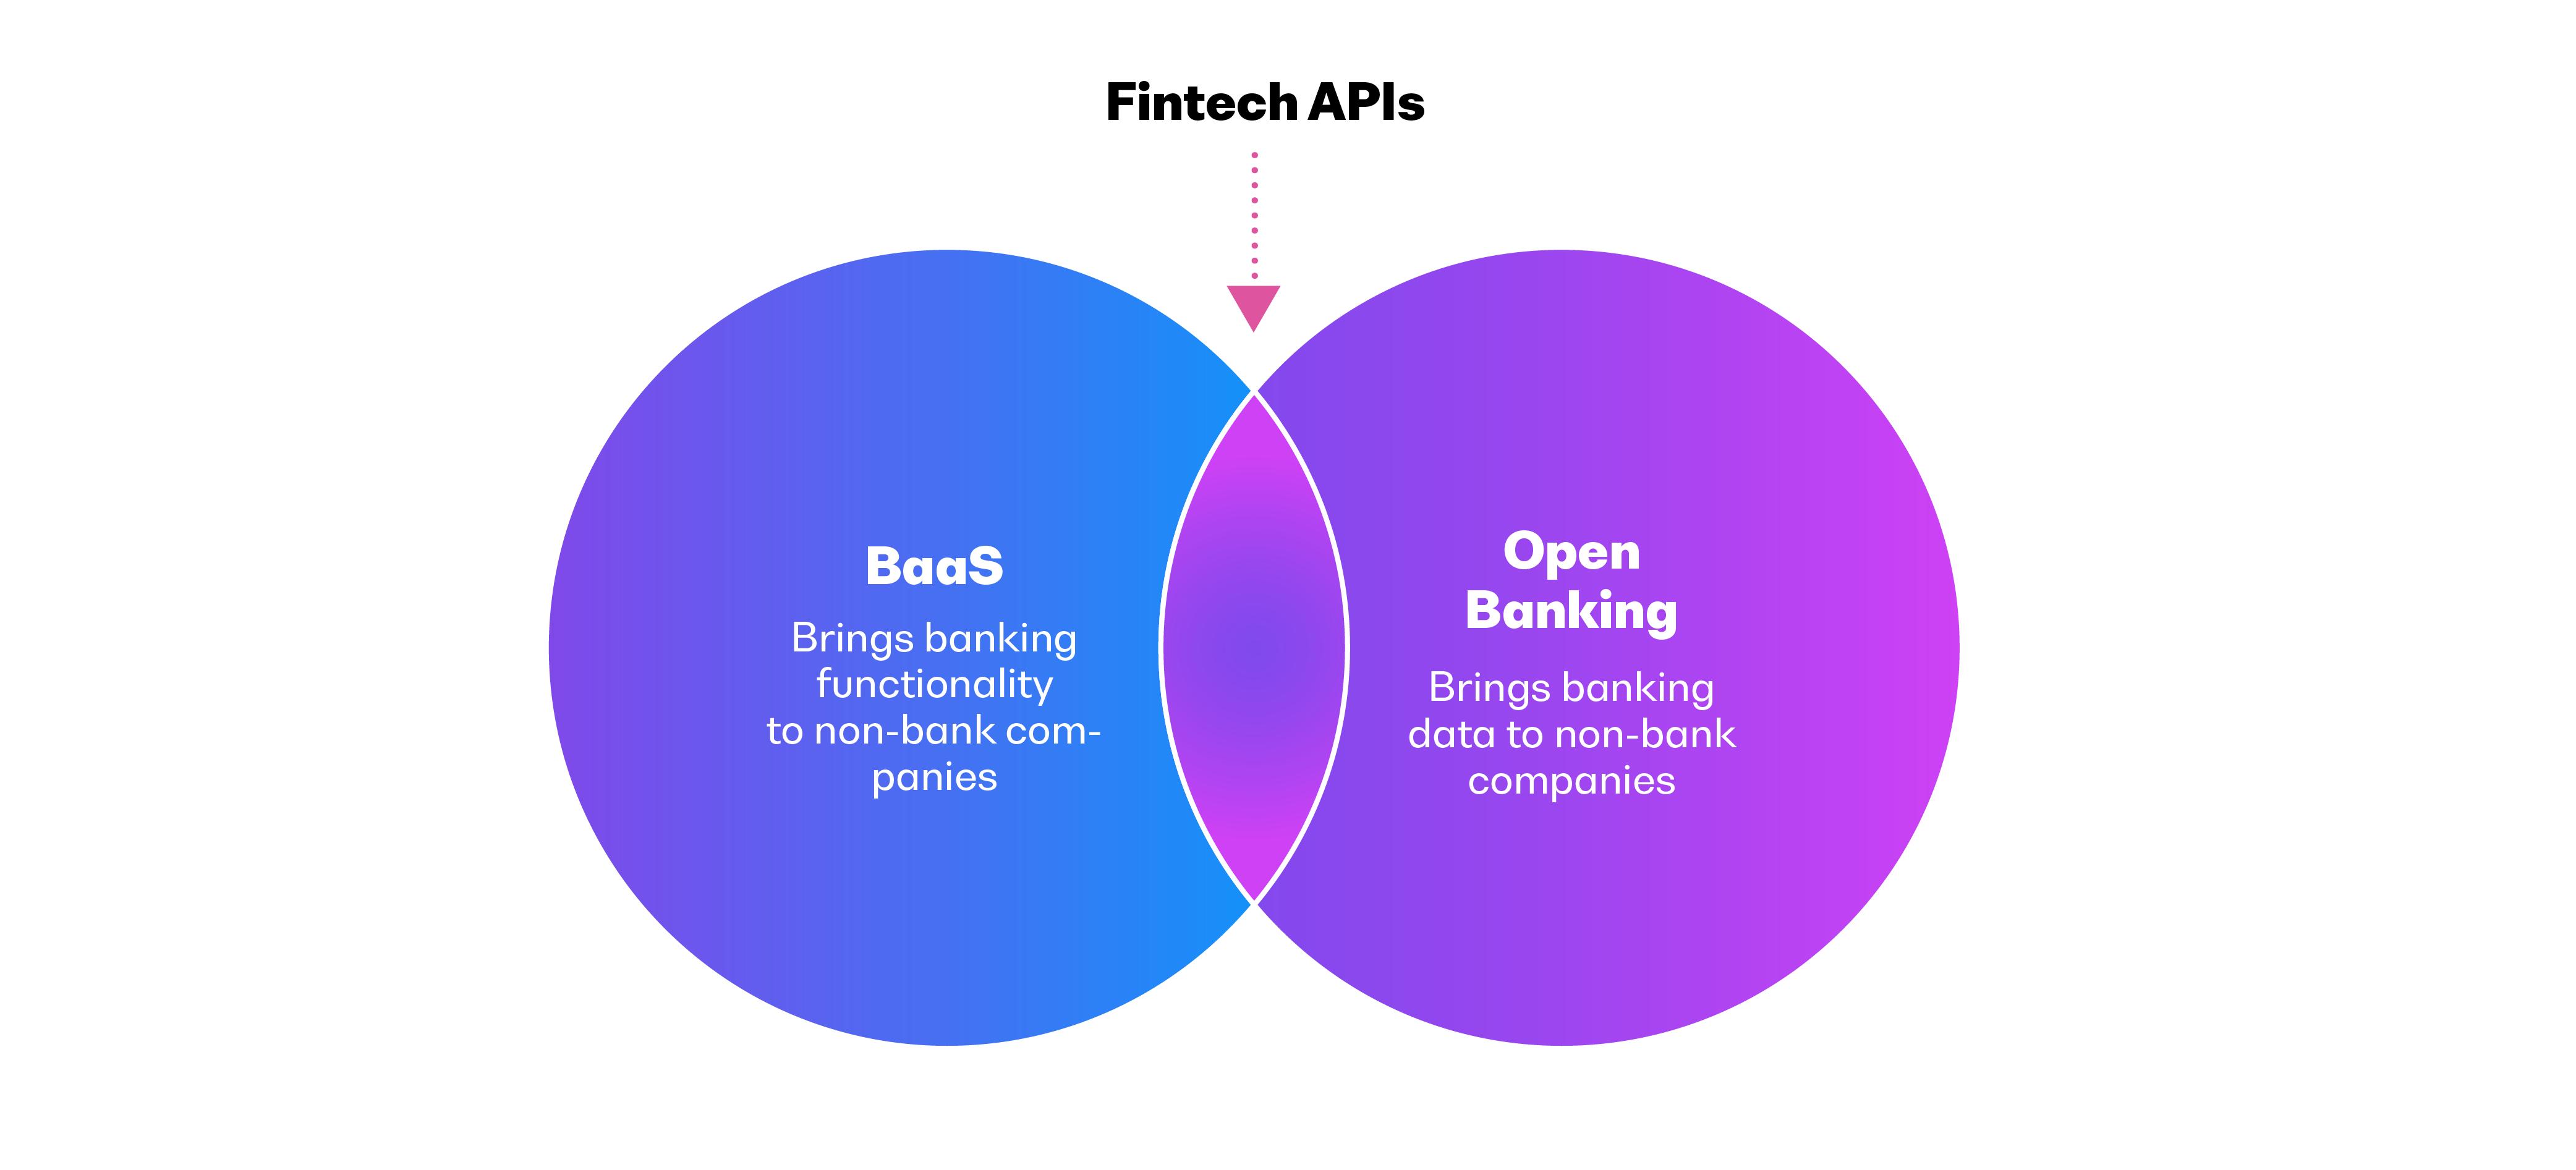 Open Banking meets BaaS